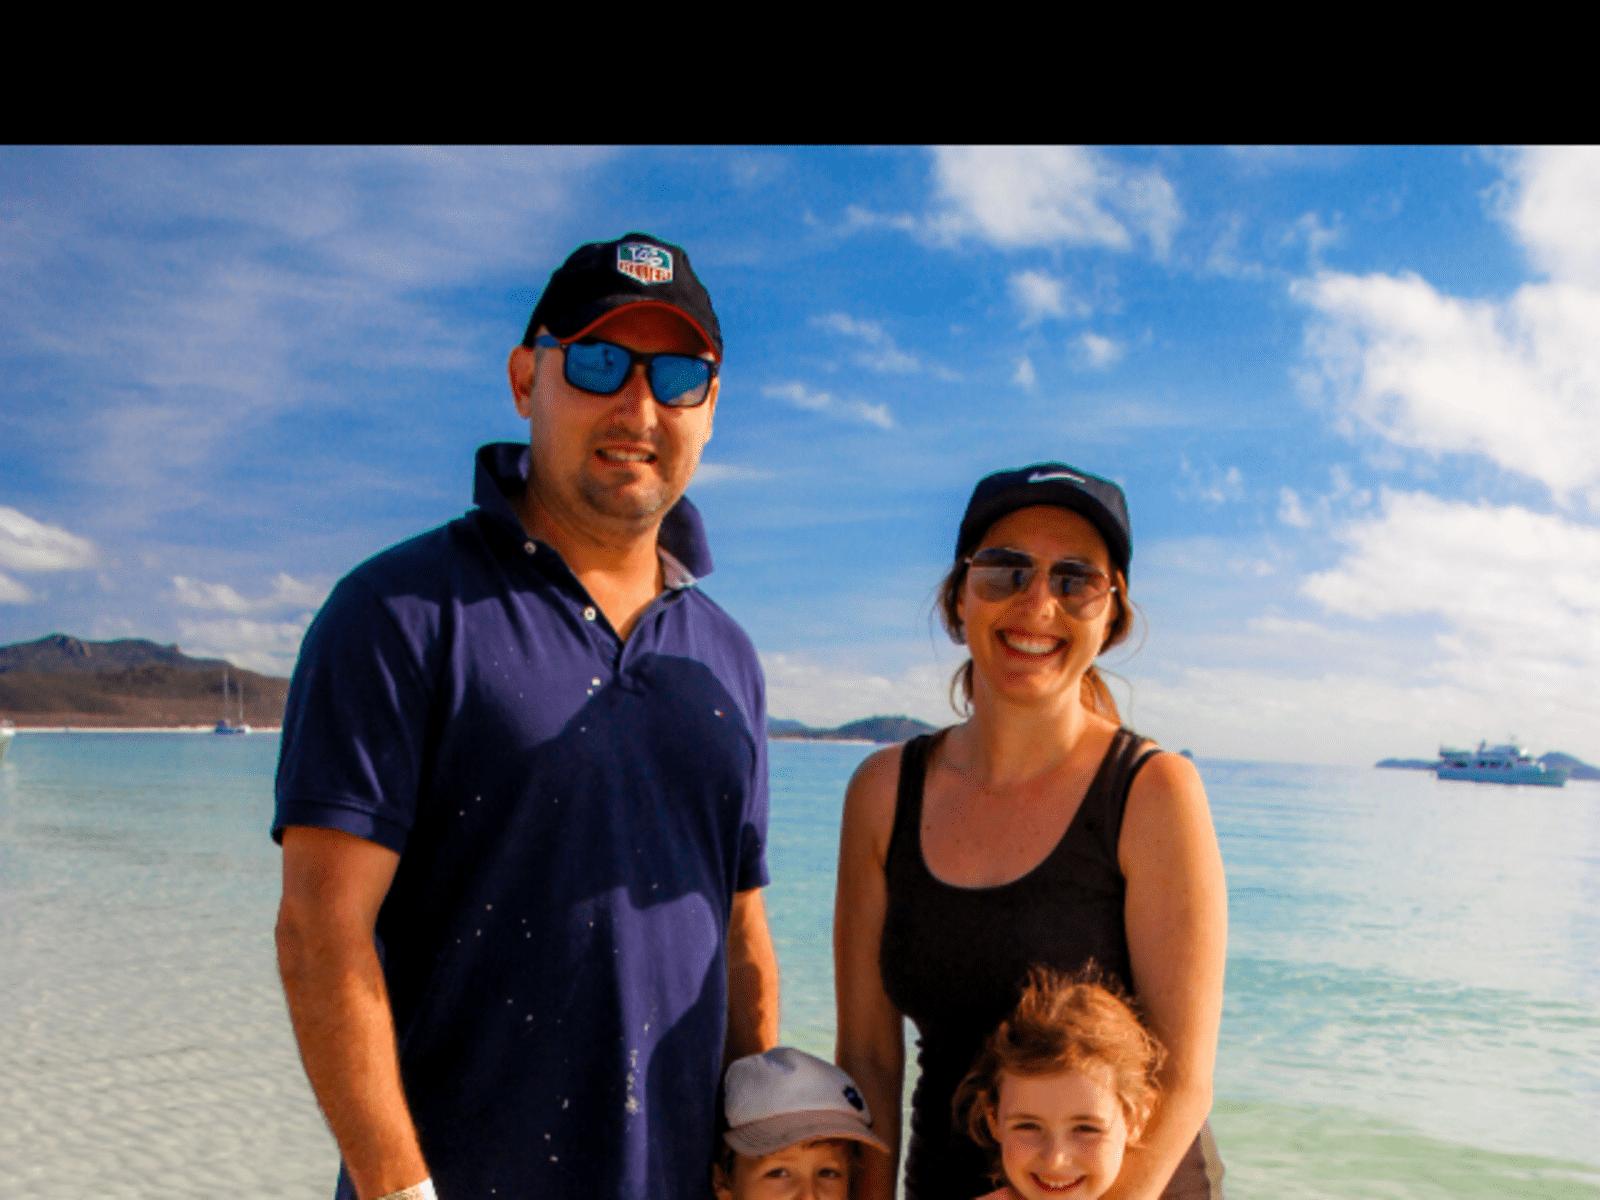 Aaron & Kathryn from Morningside, Queensland, Australia